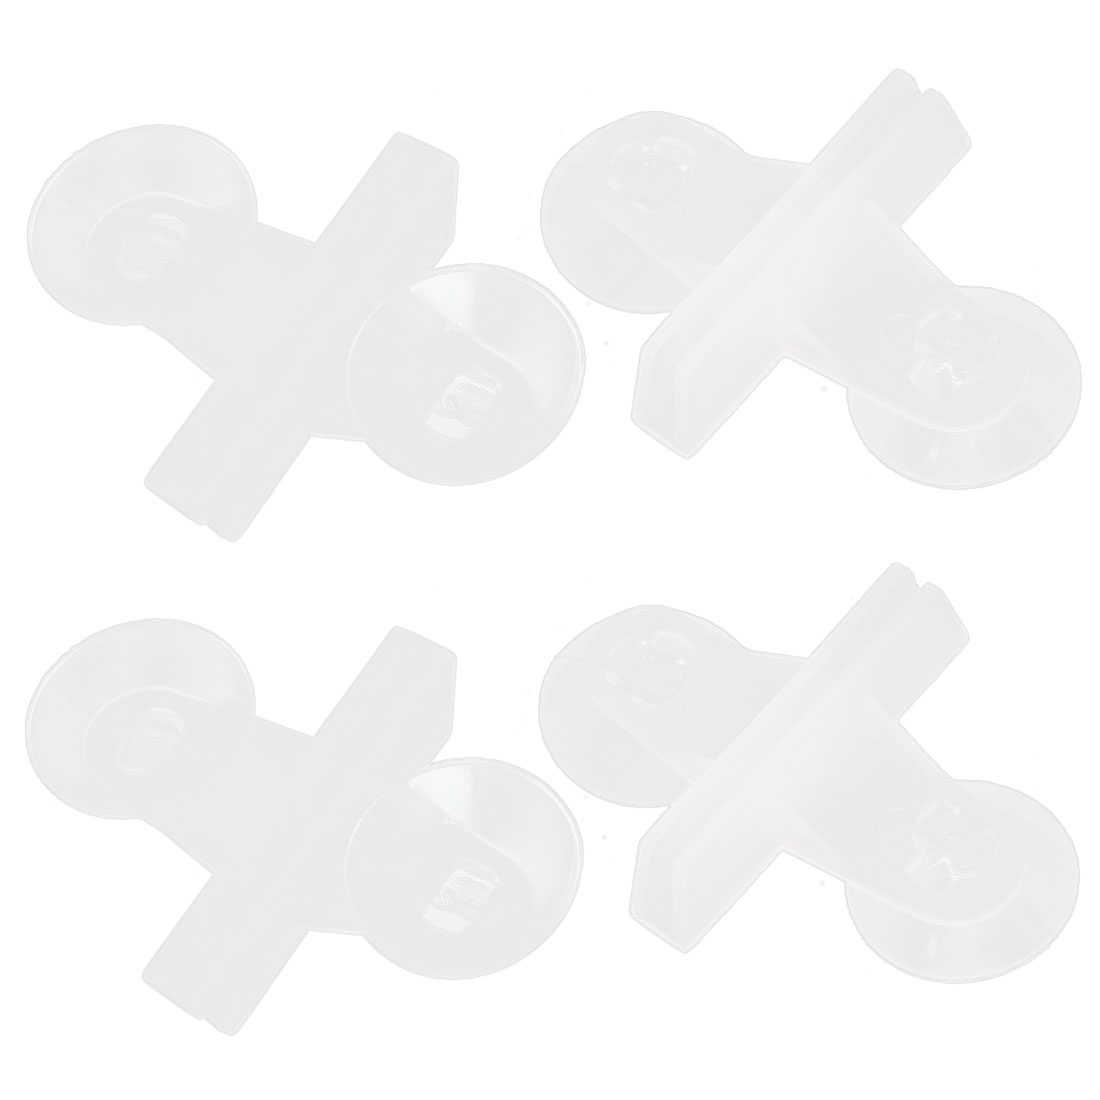 Aquarium Fish Tank Plastic Glass Suction Cup Divider Sheet Holder White 4Pcs